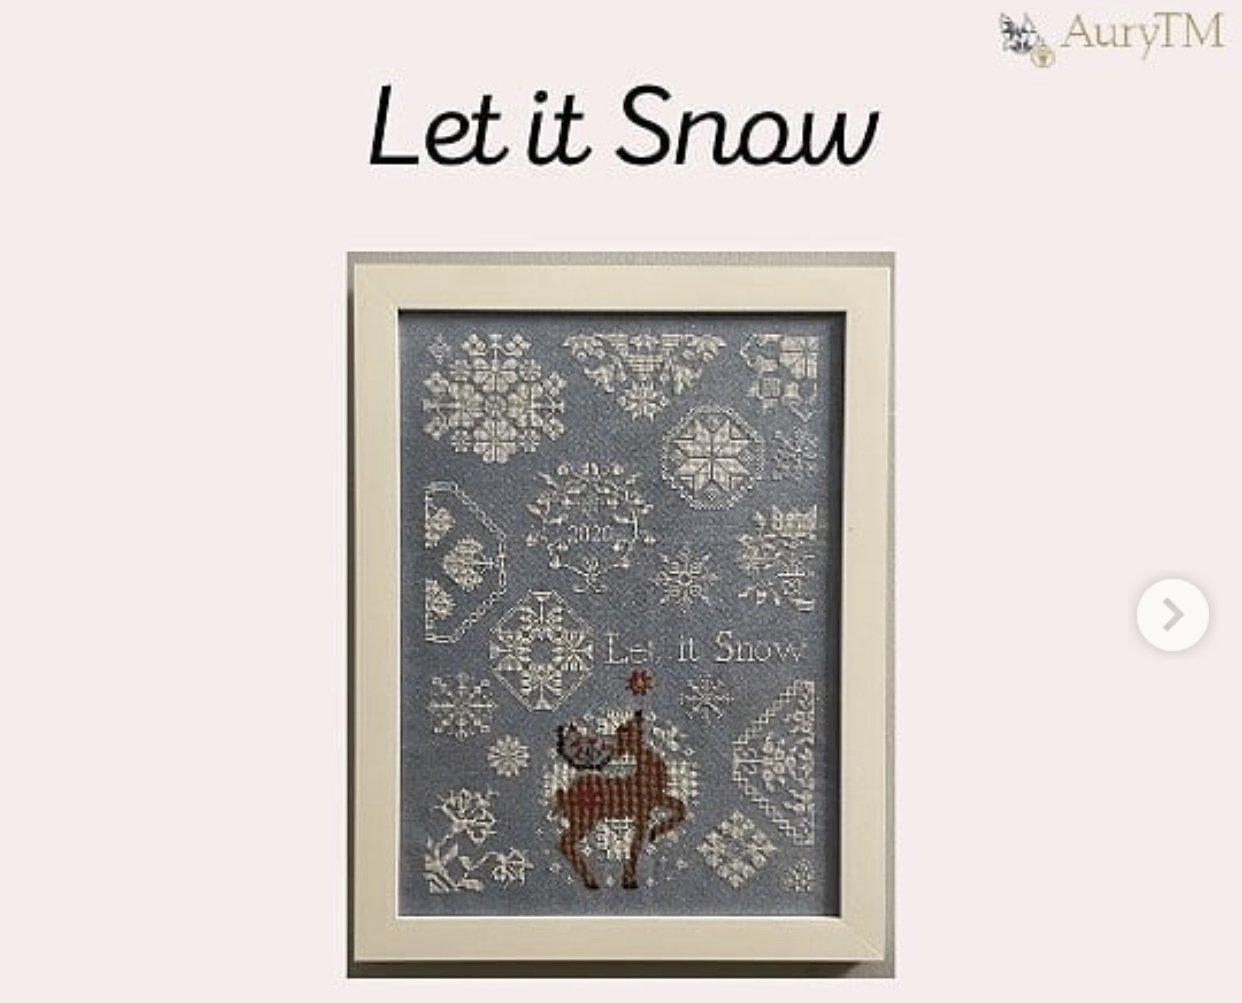 AuryTM Let It Snow